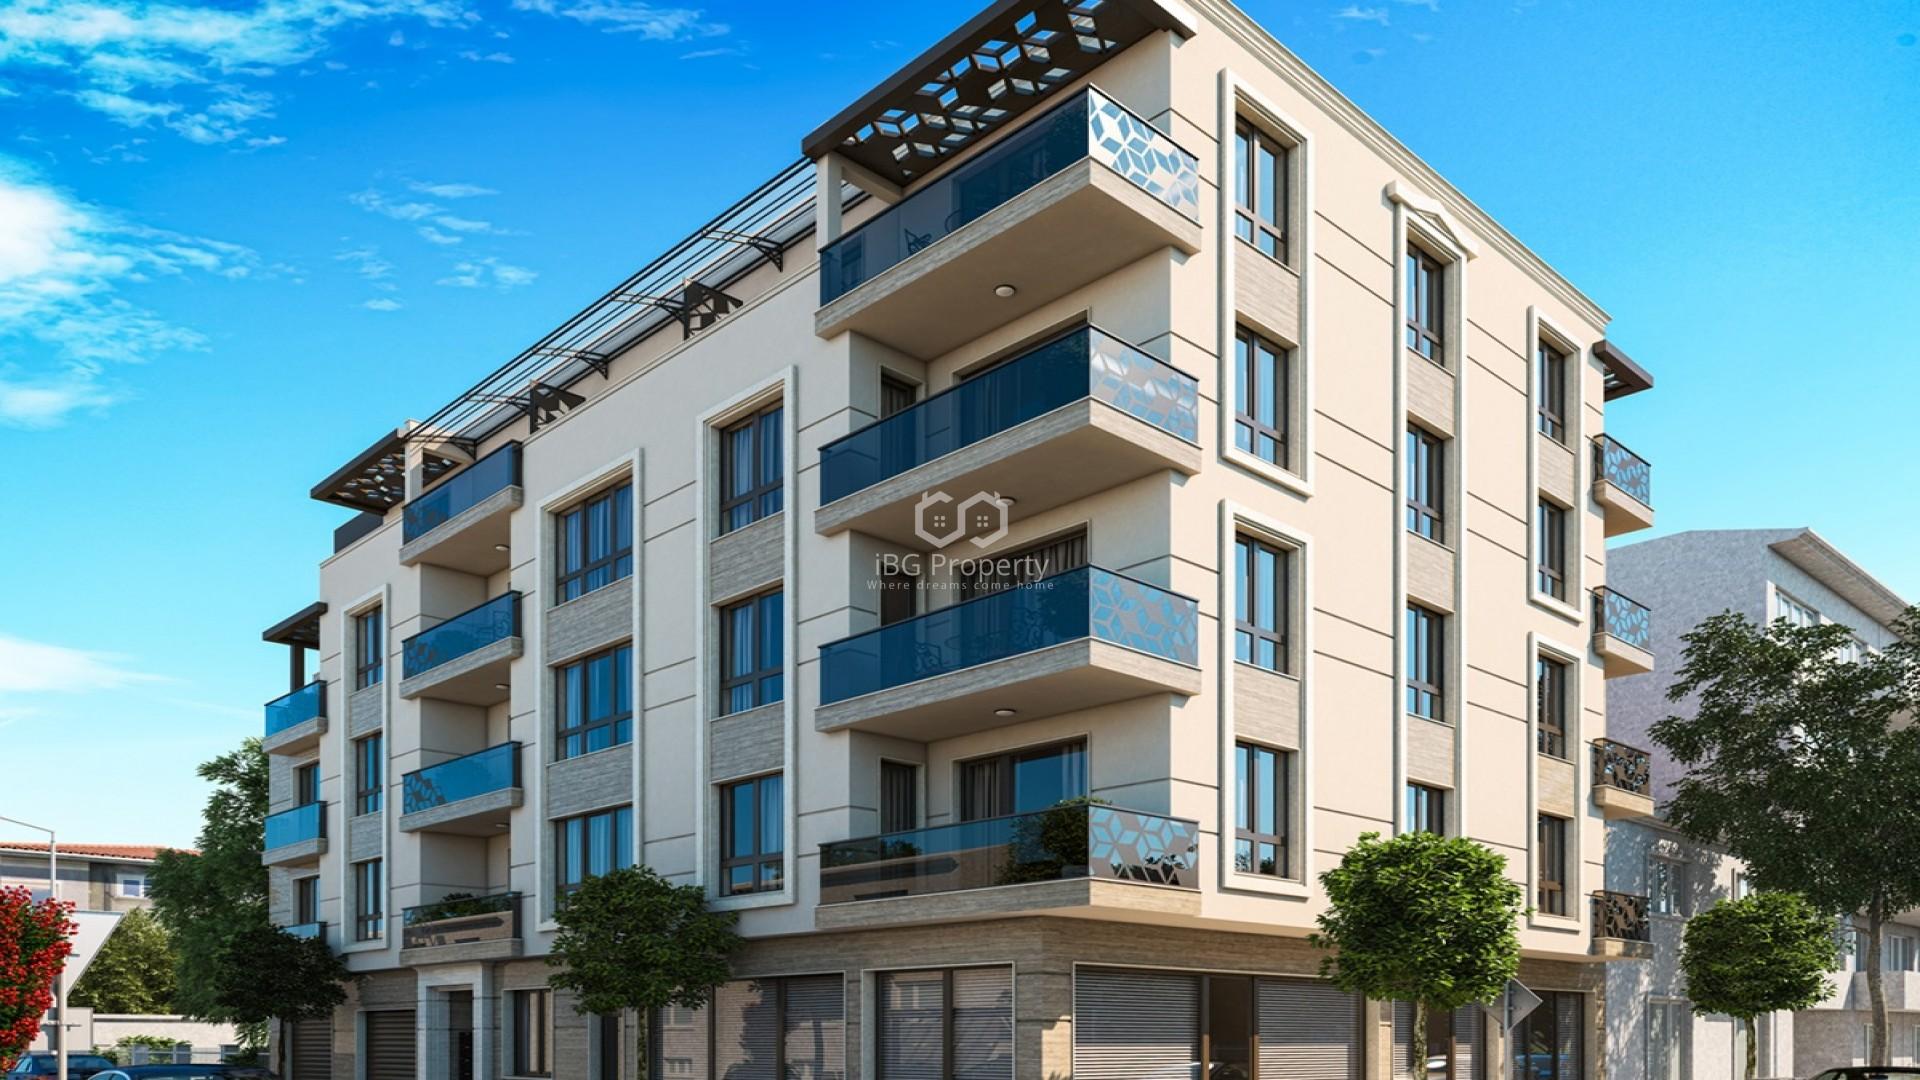 Двухкомнатная квартира Поморие 38 m2